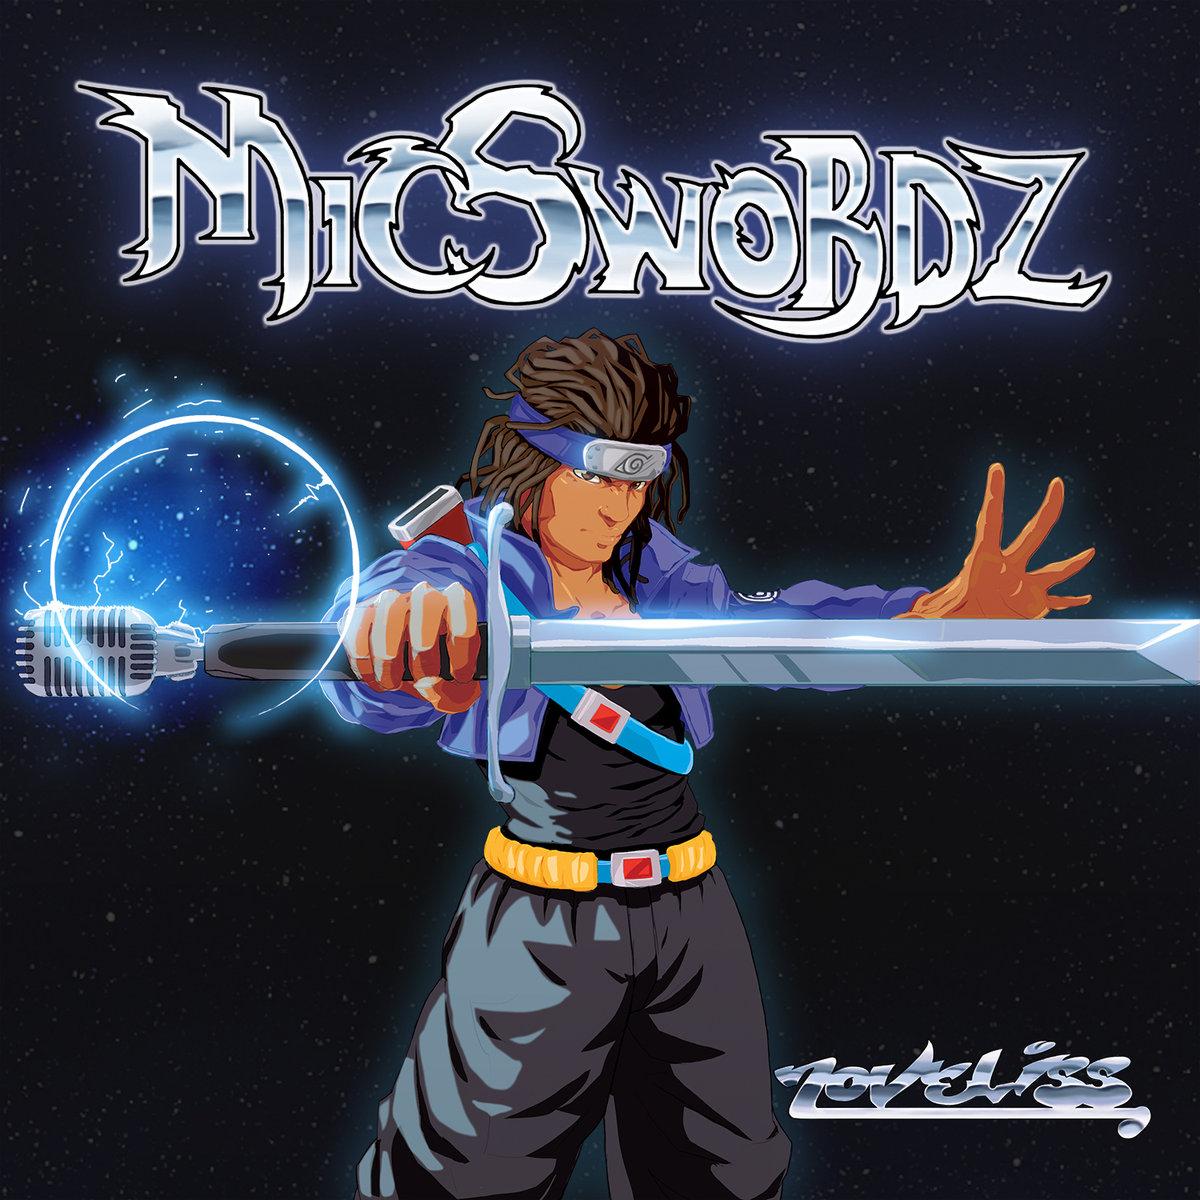 Stream_noveliss_presenta_mic_swordz